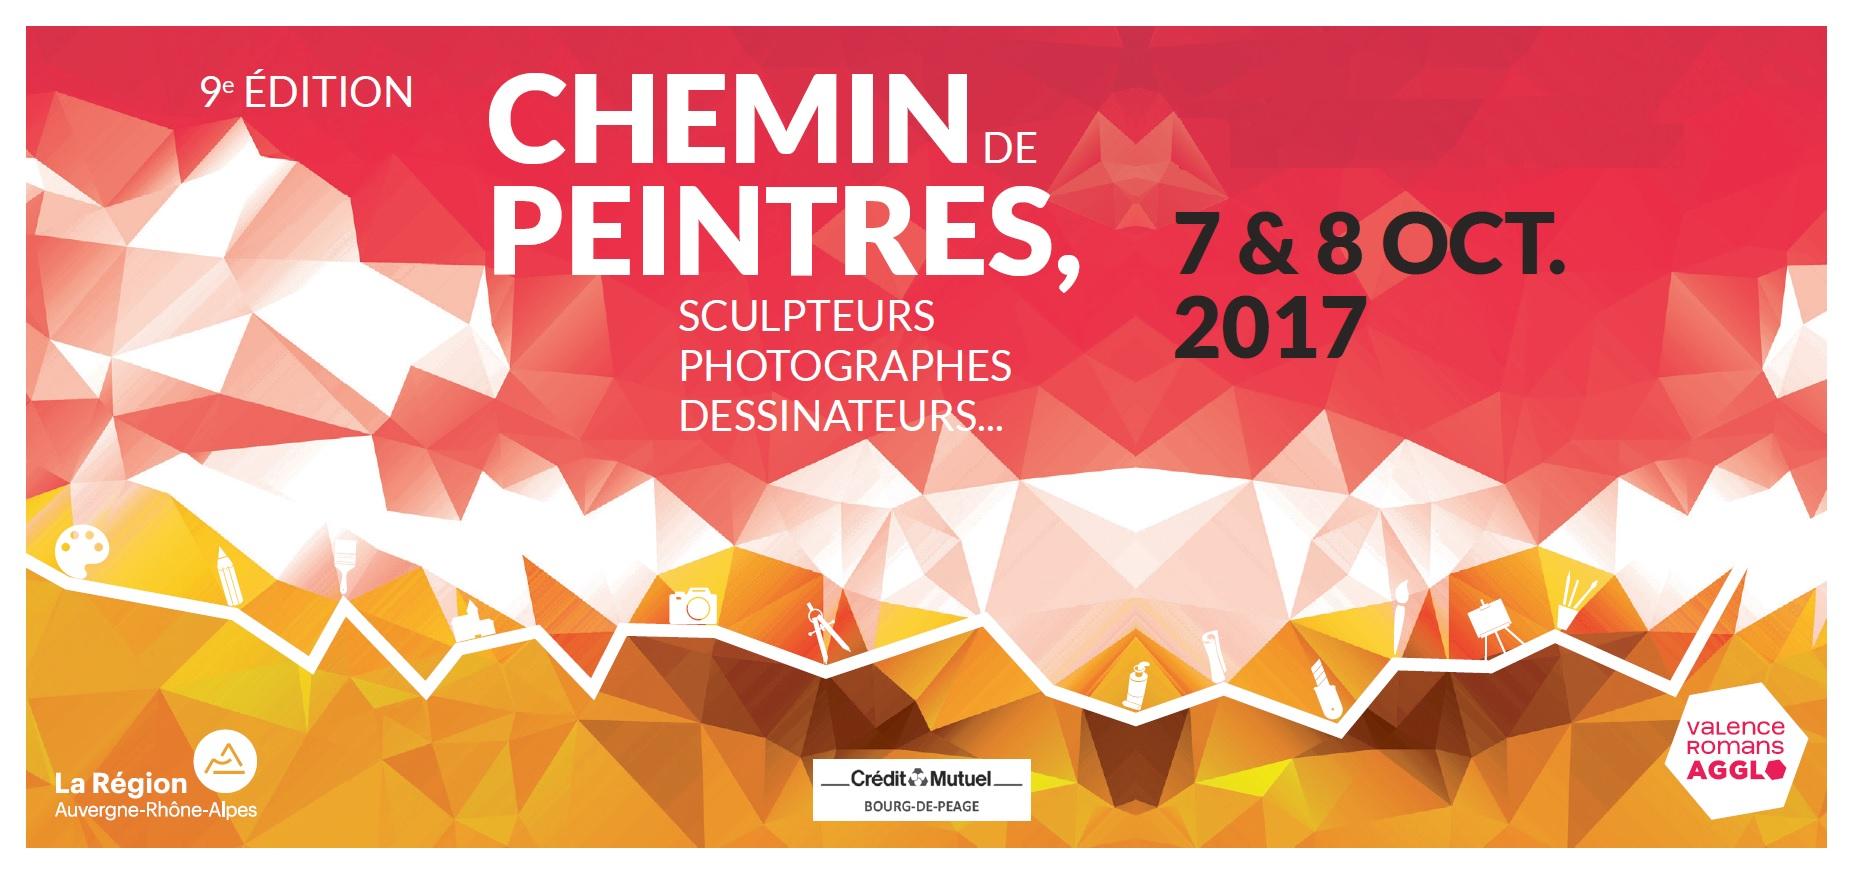 CheminPeintre2017